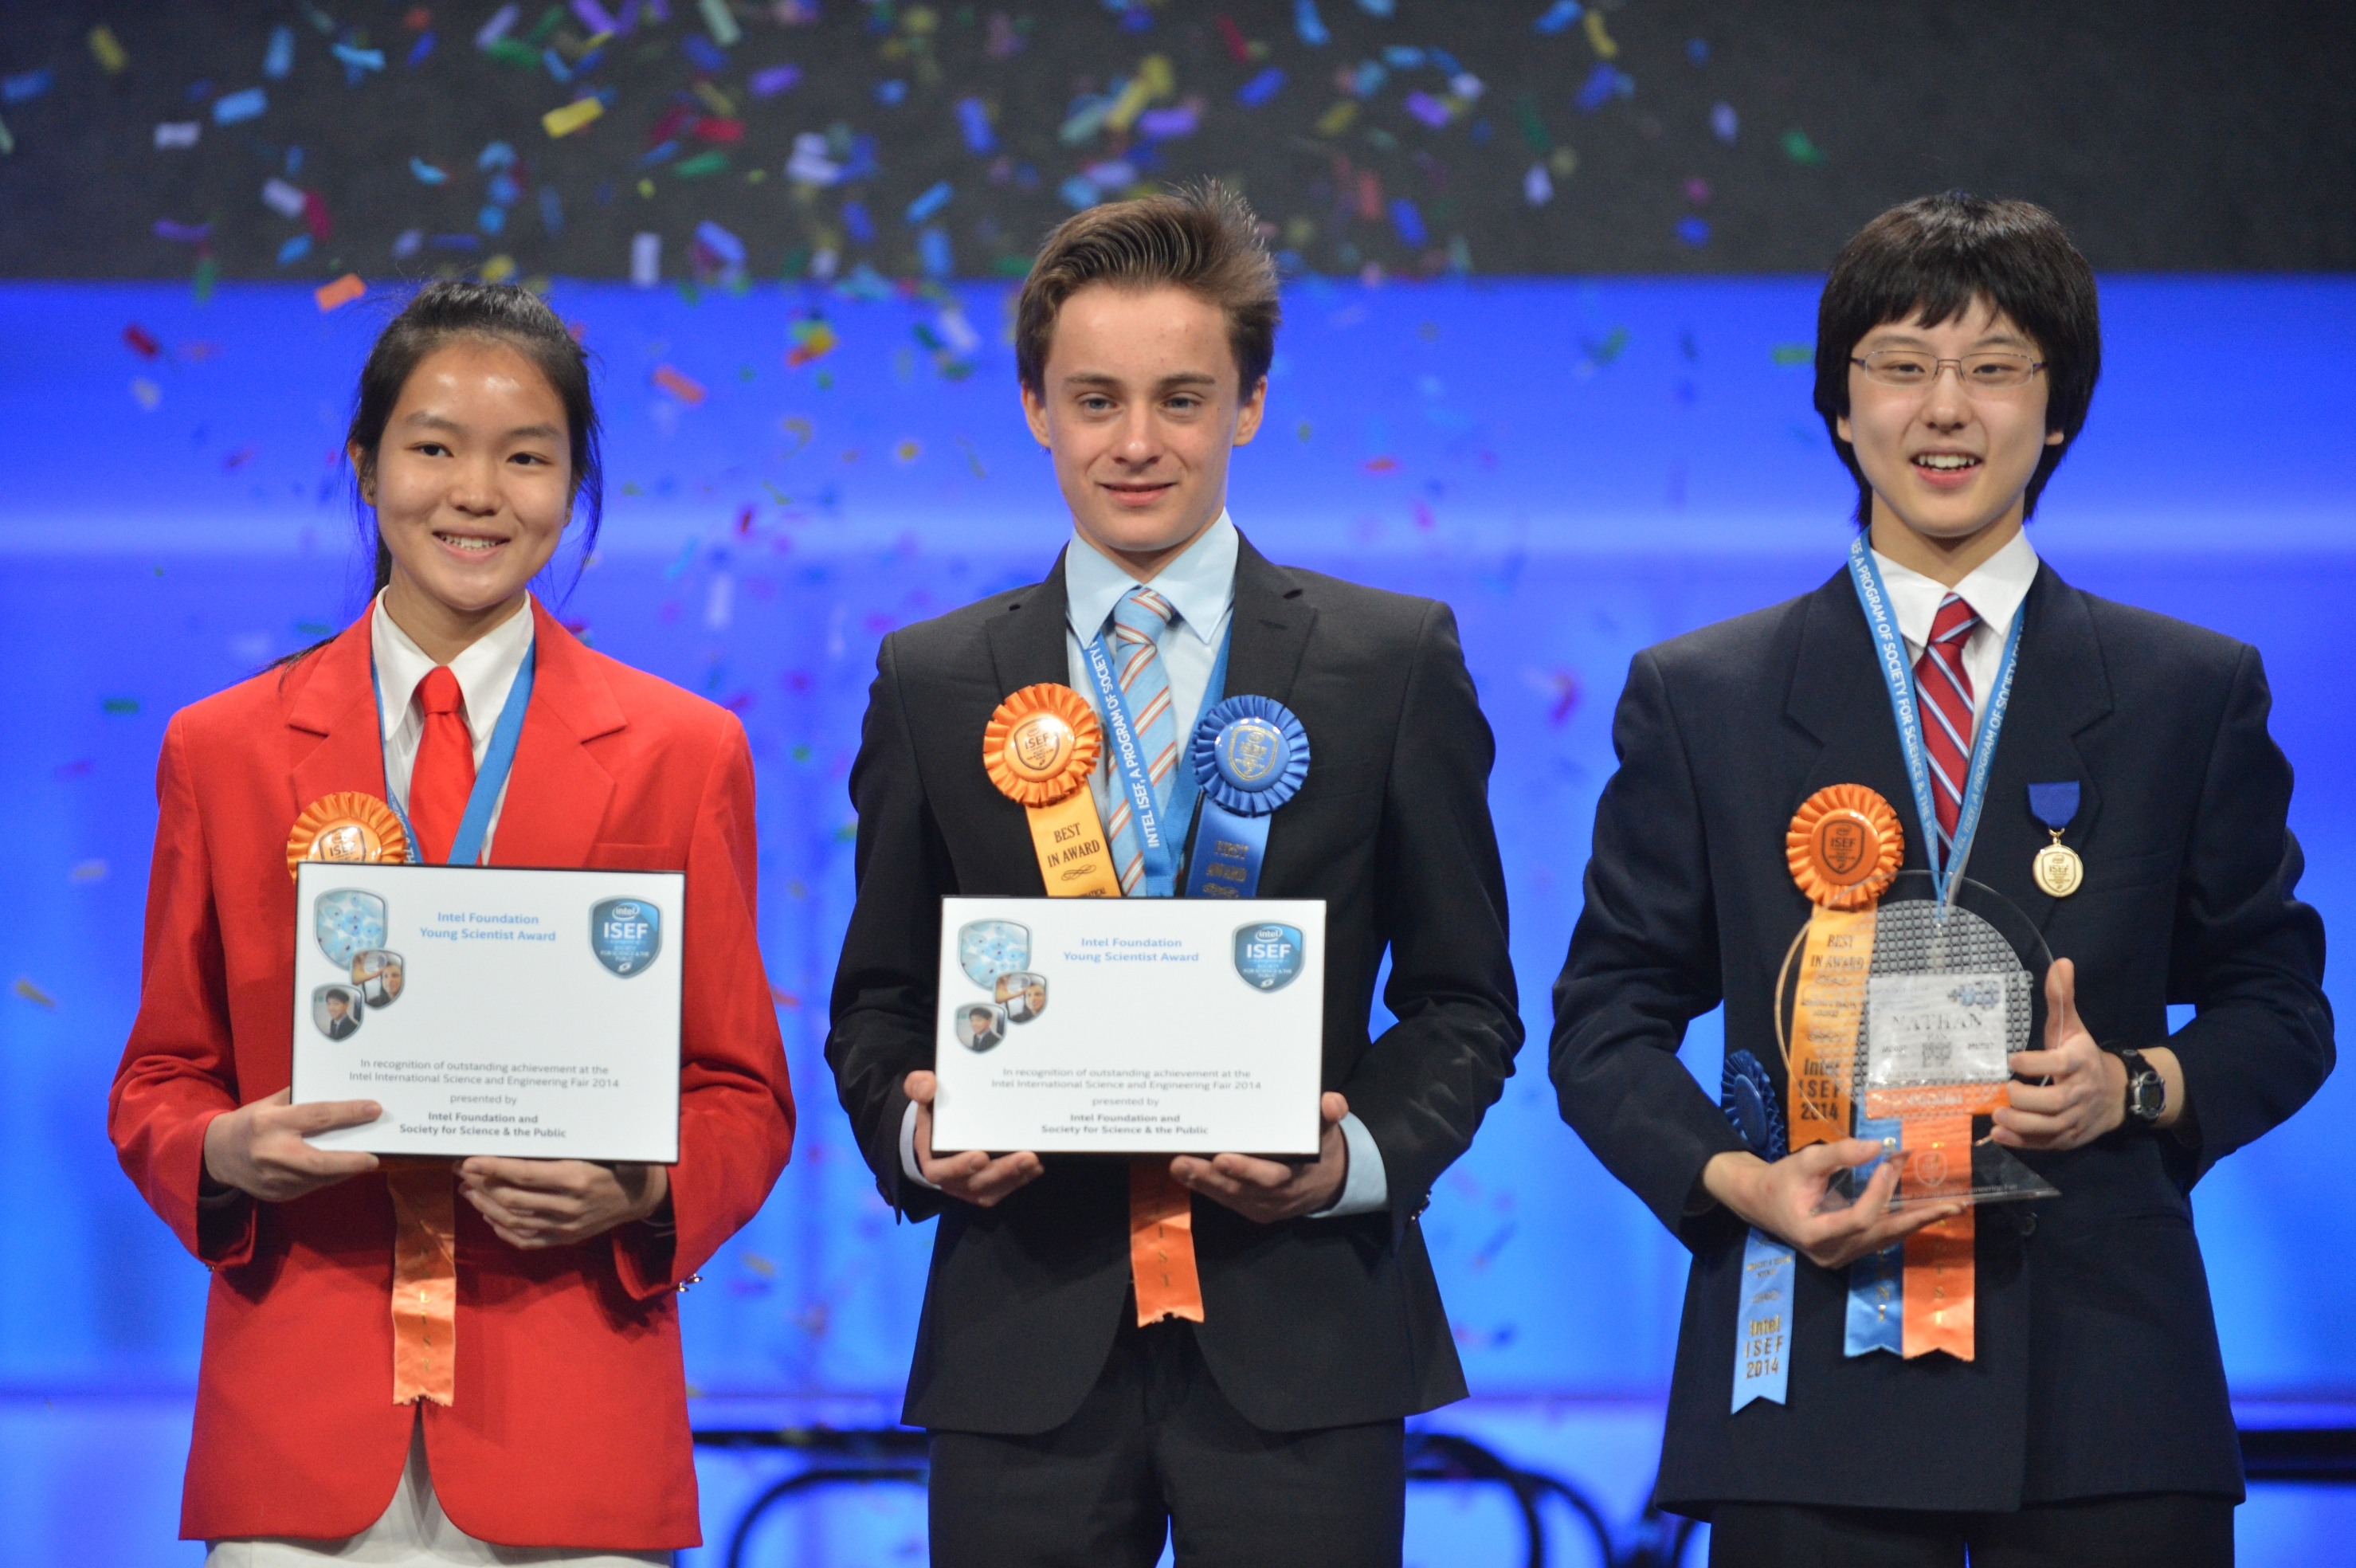 Intel_ISEF_2014_Grand_Award_Ceremony_Top_Three_001